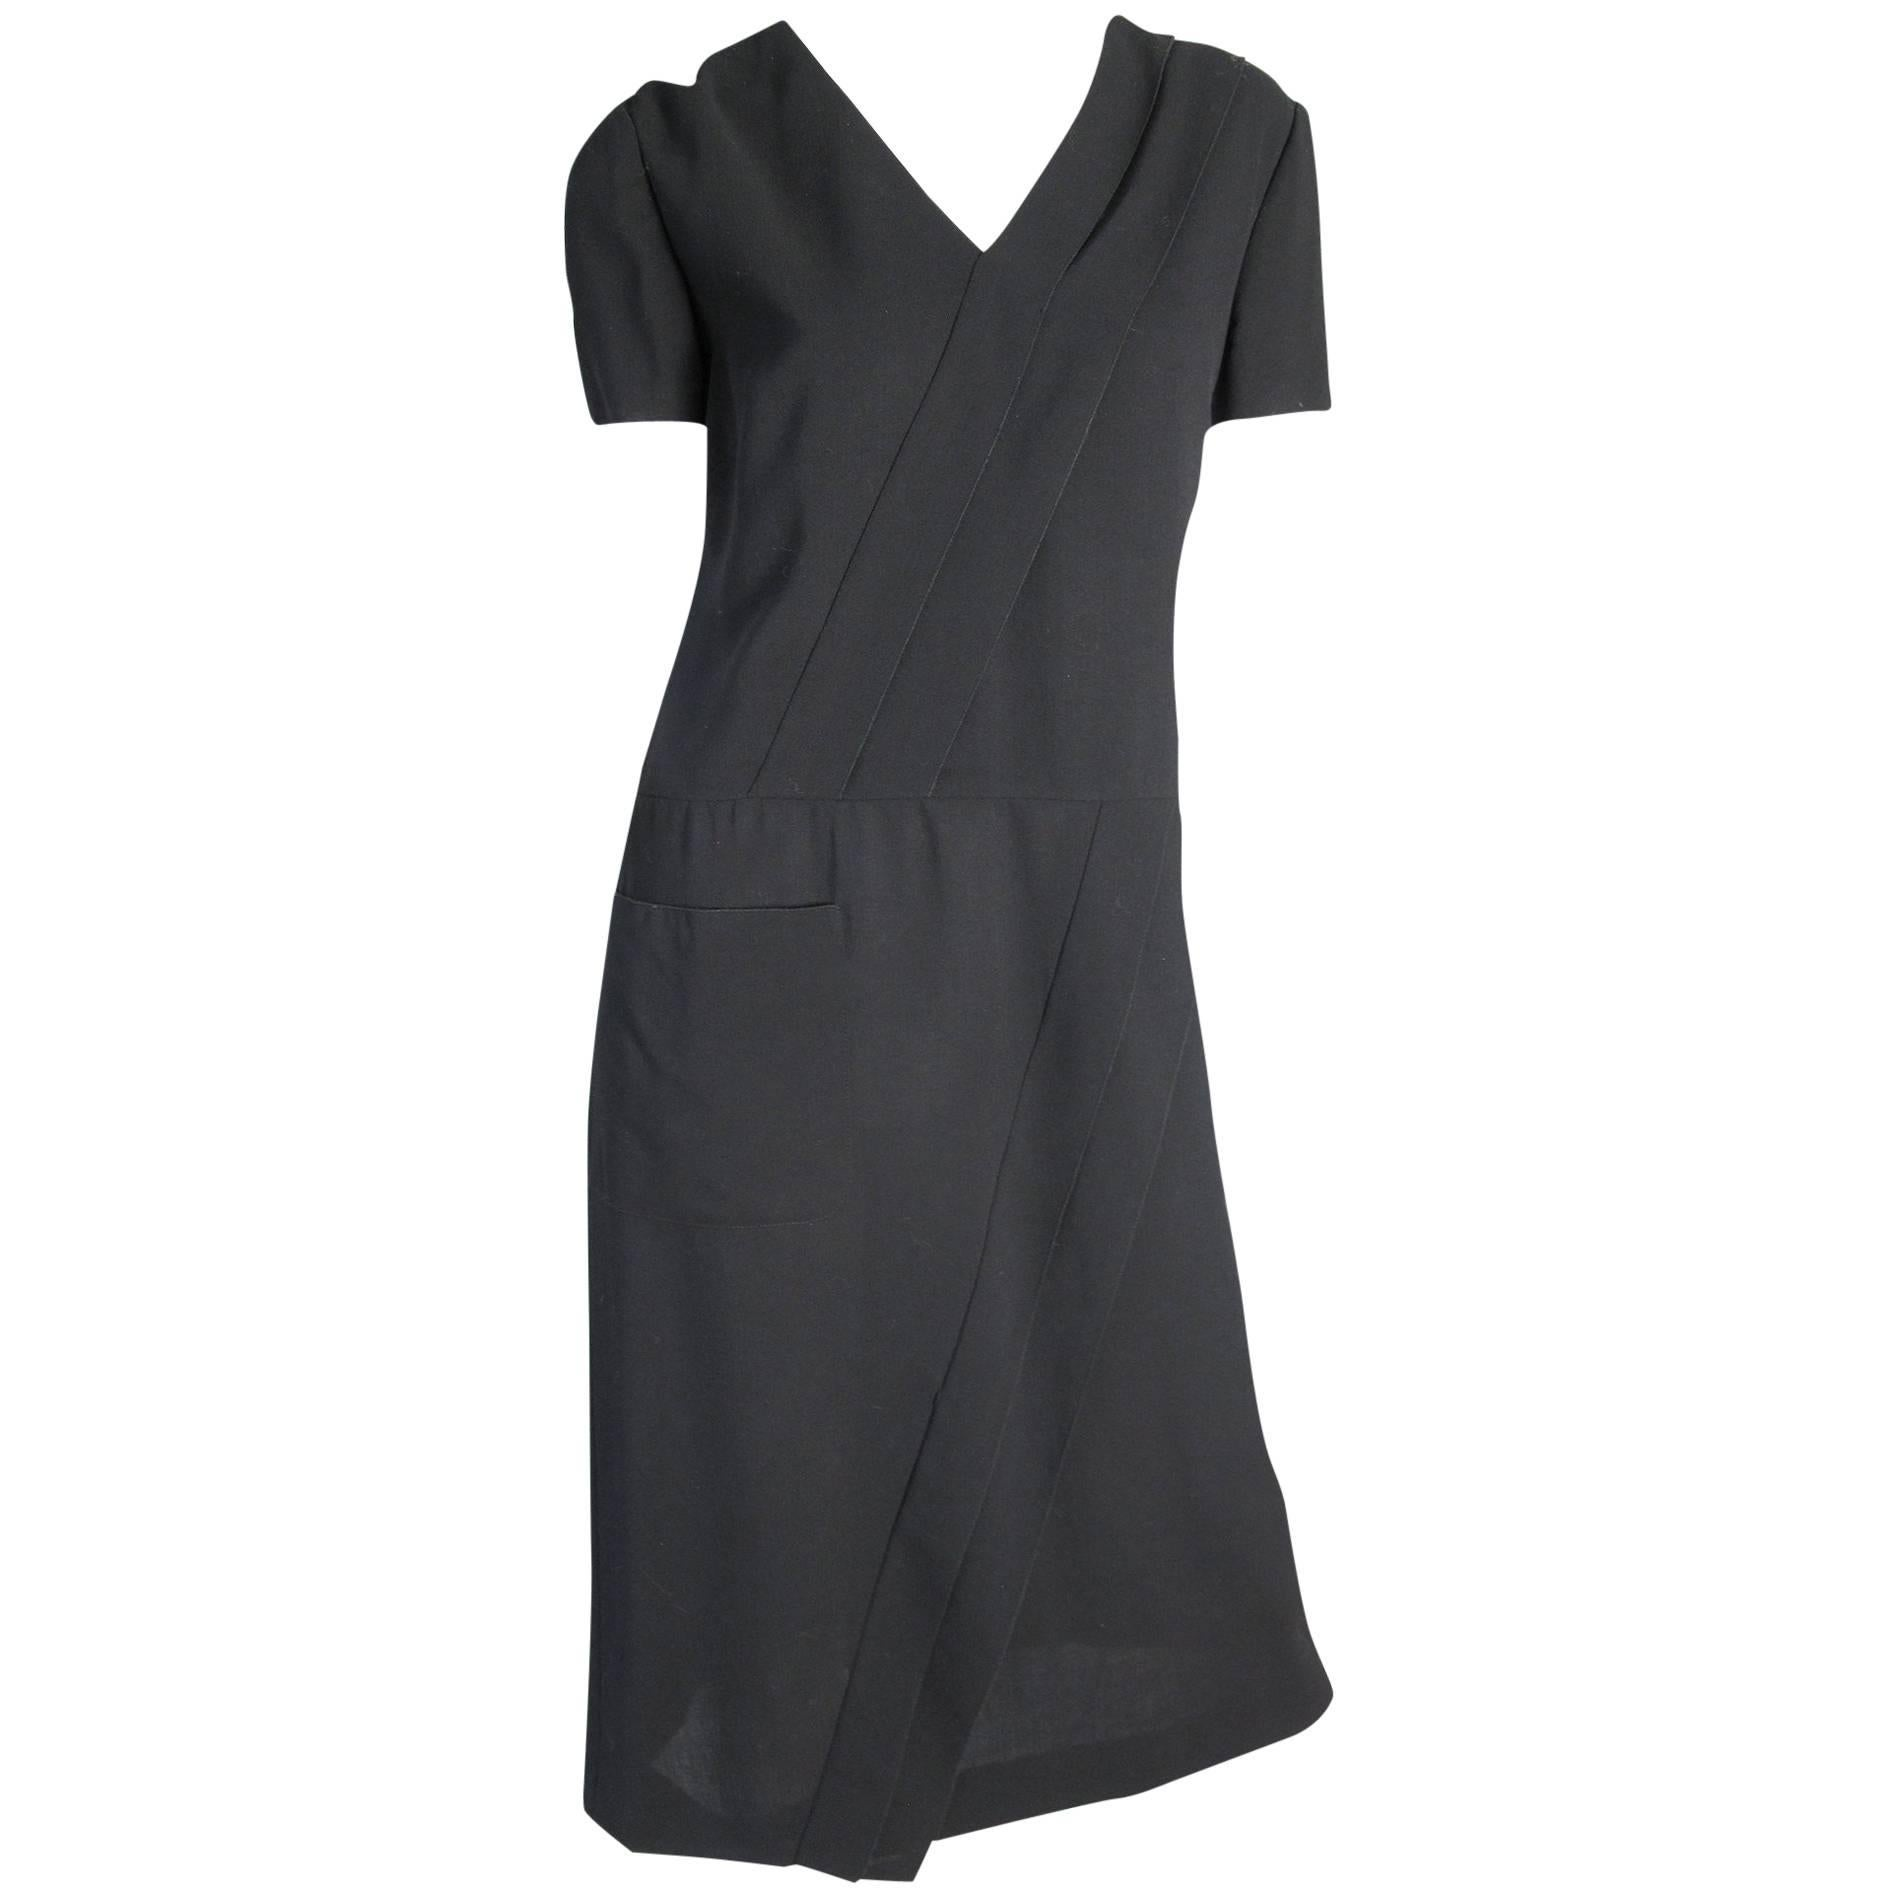 Chanel Black Dress with Diagonal Trim